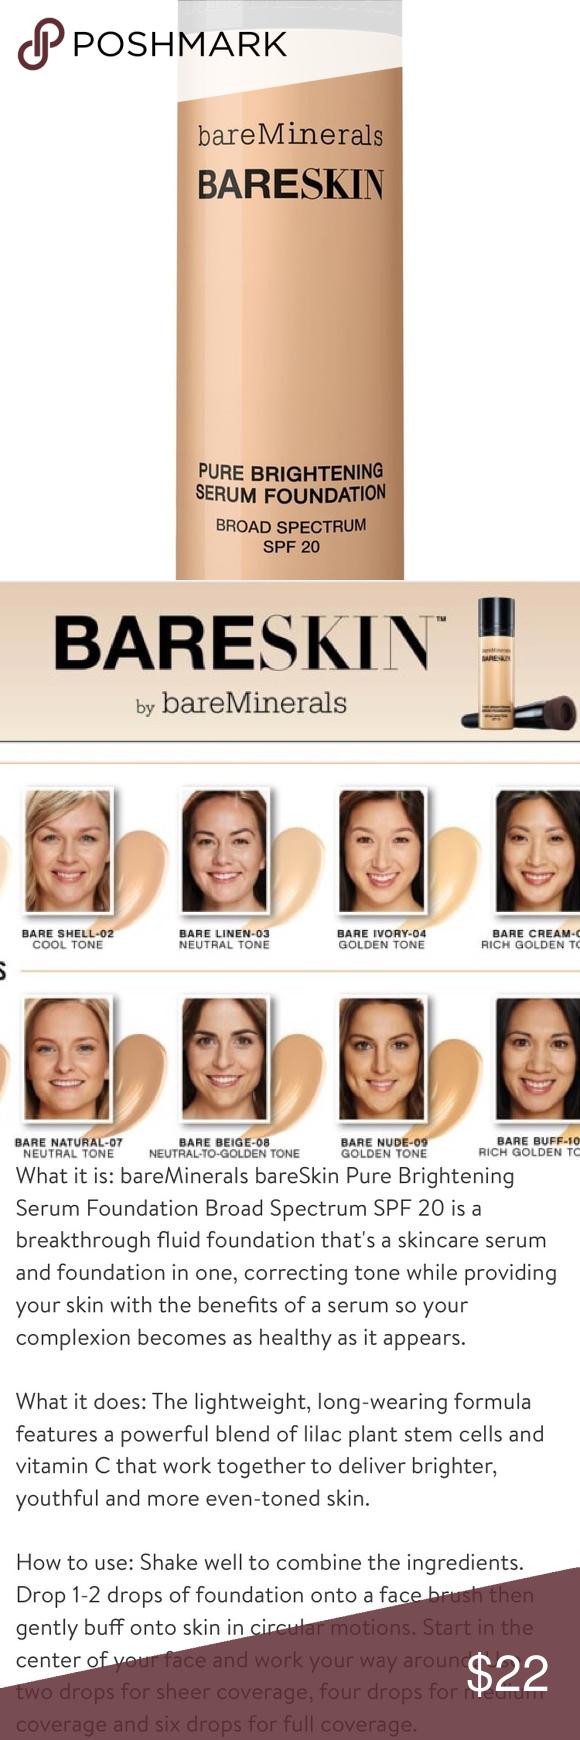 bareskin serum foundation